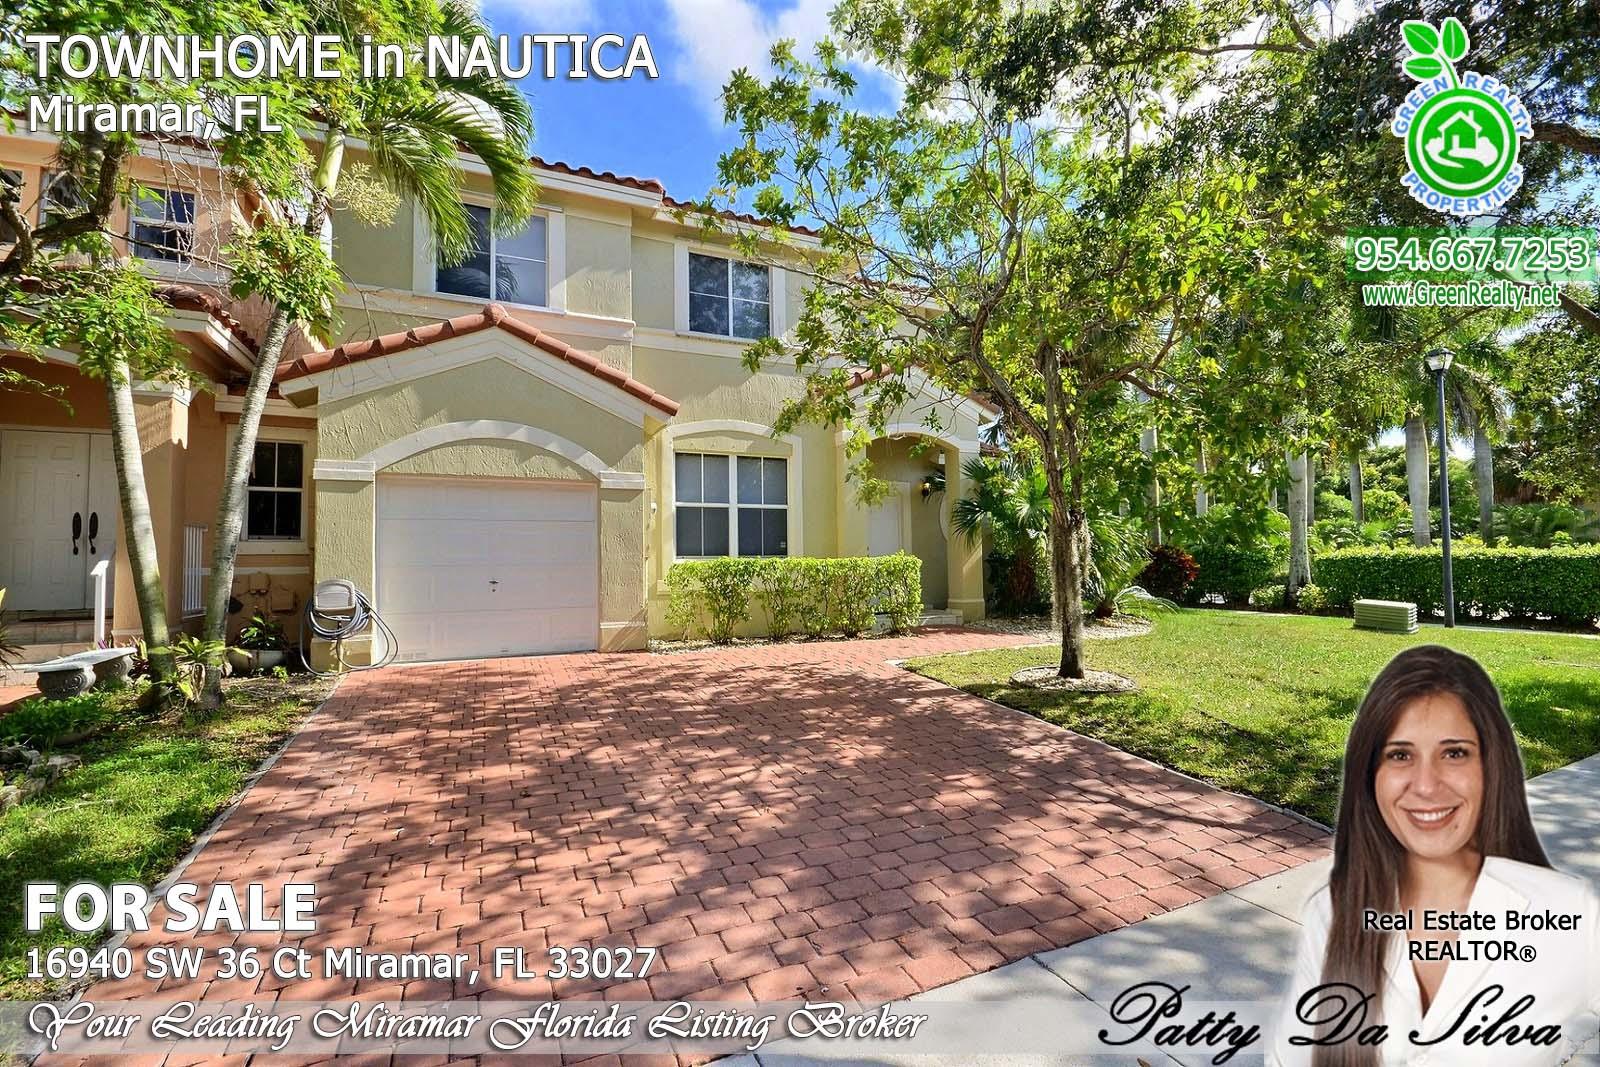 16940 SW 36 Ct Miramar, FL 33027 - Nautica Miramar Homes For Sale (2)